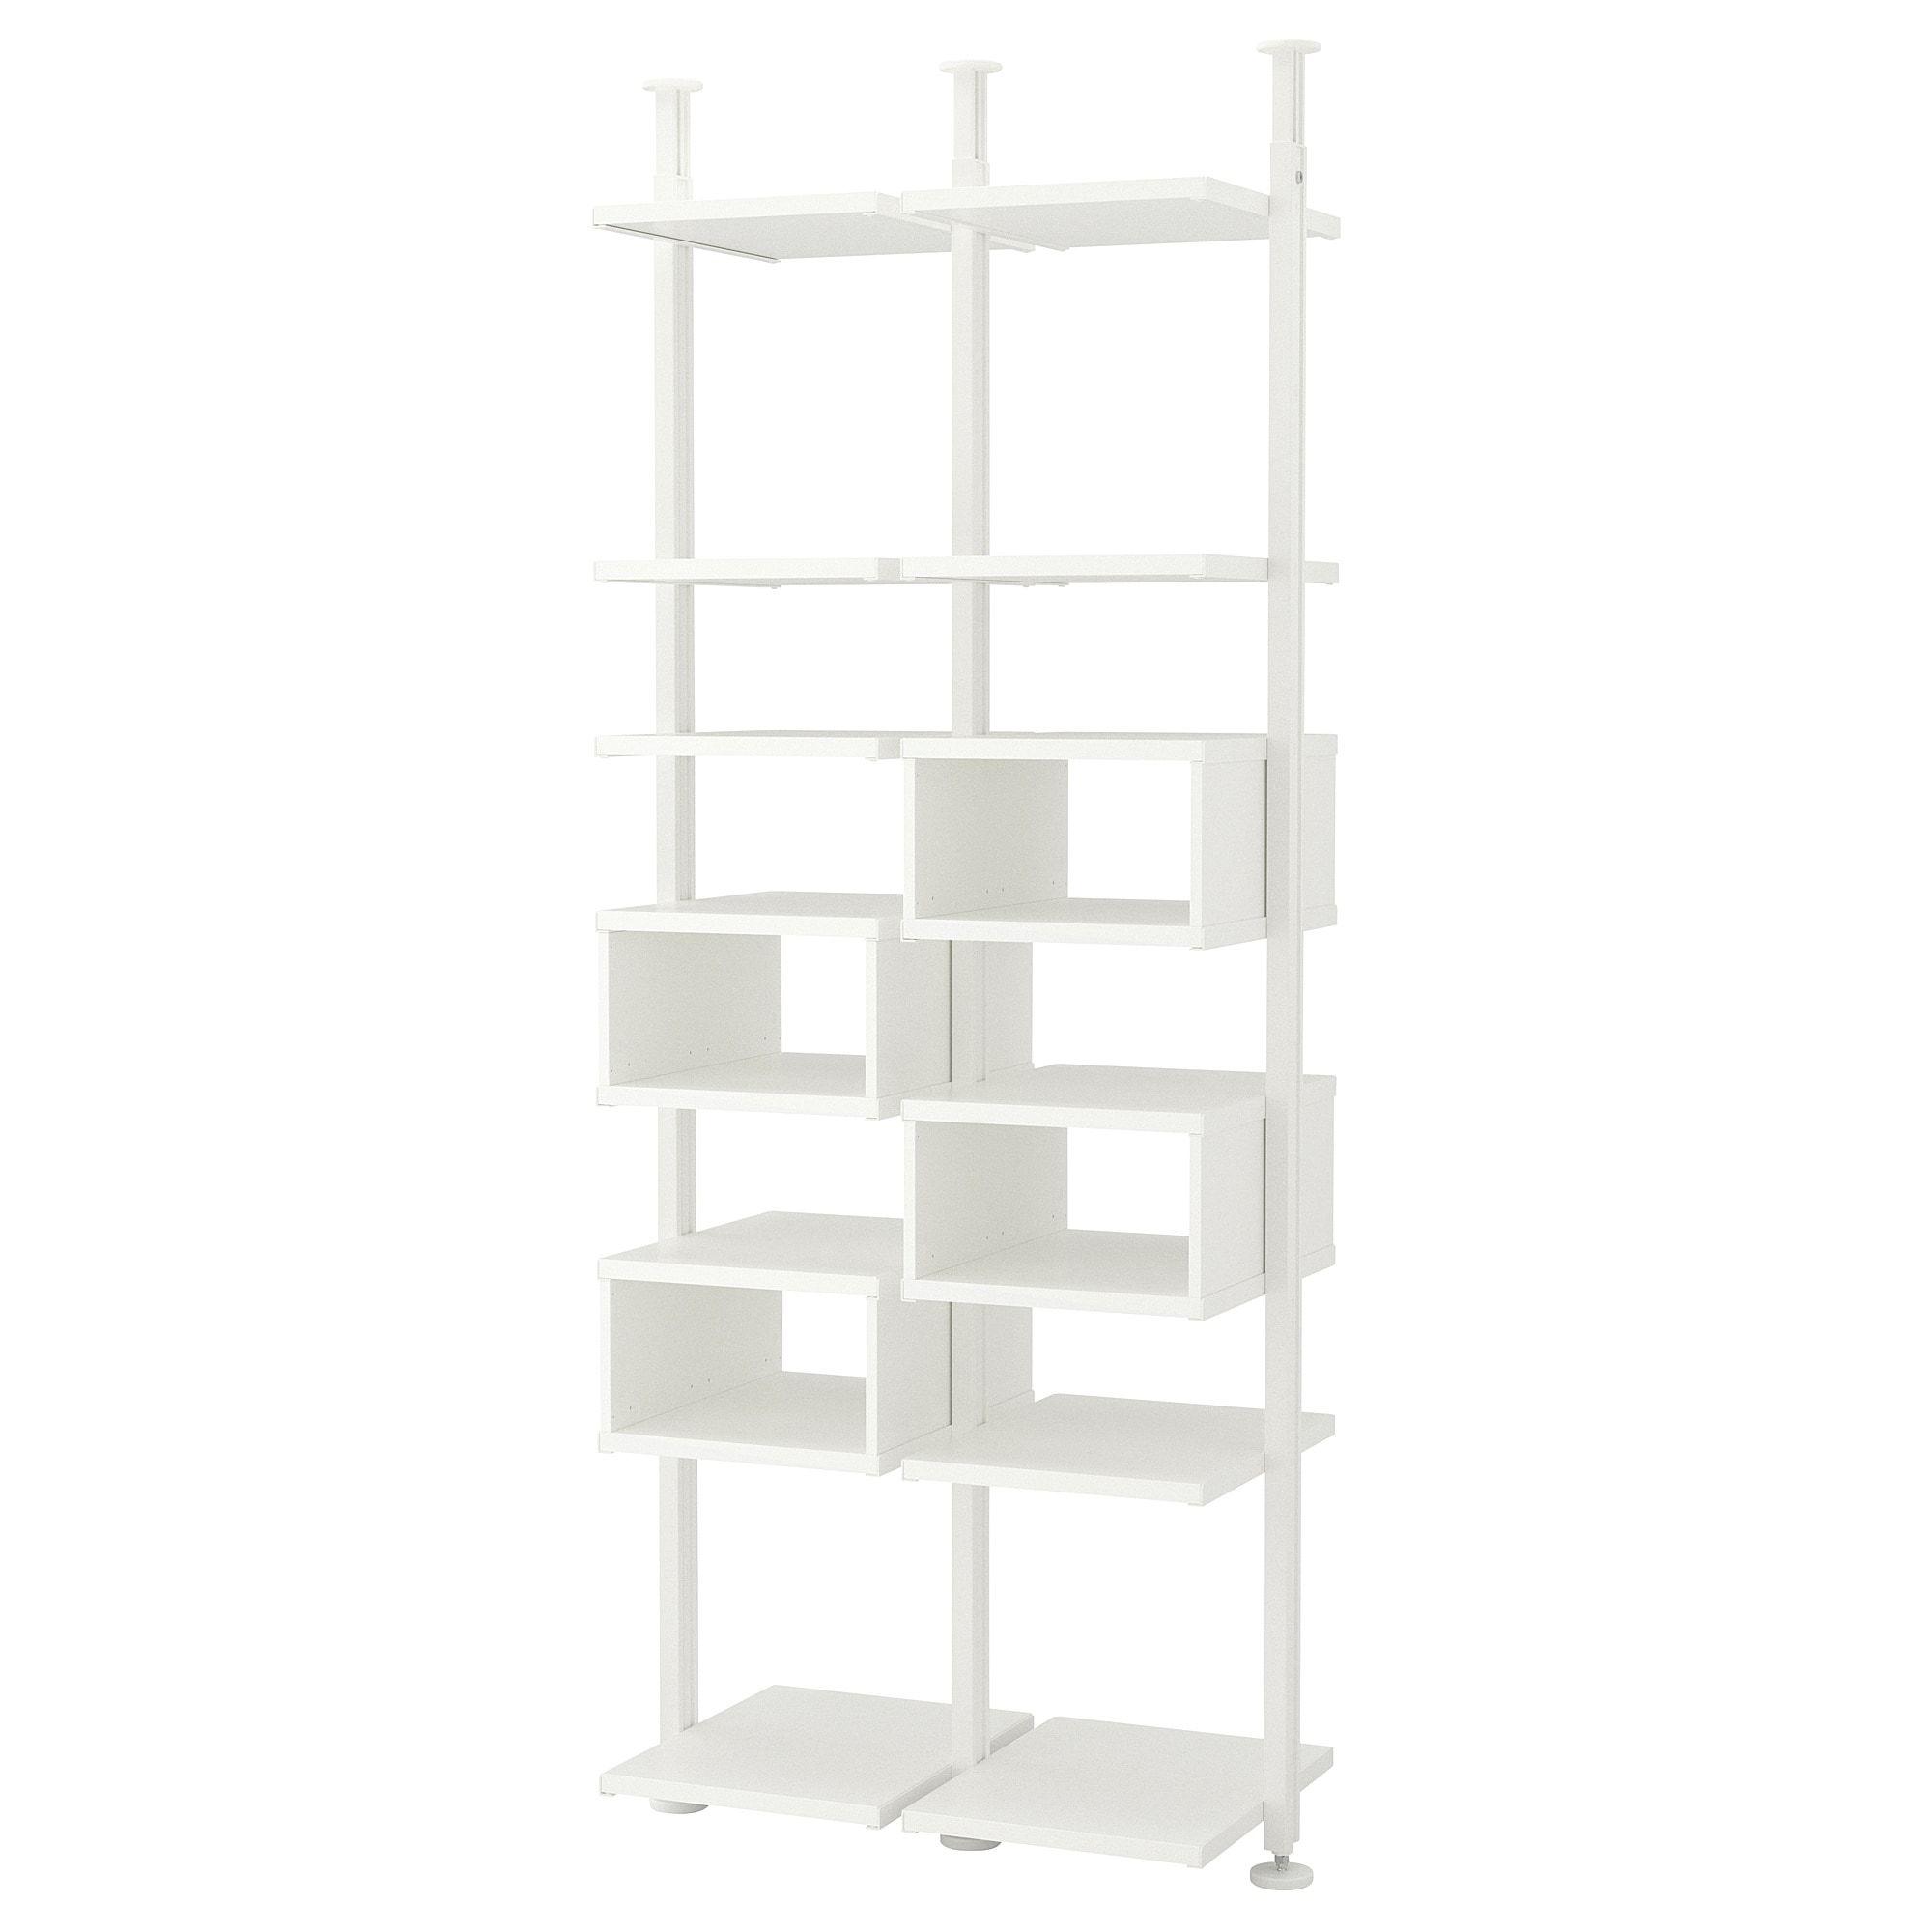 Ikea Stainless Steel Shelves